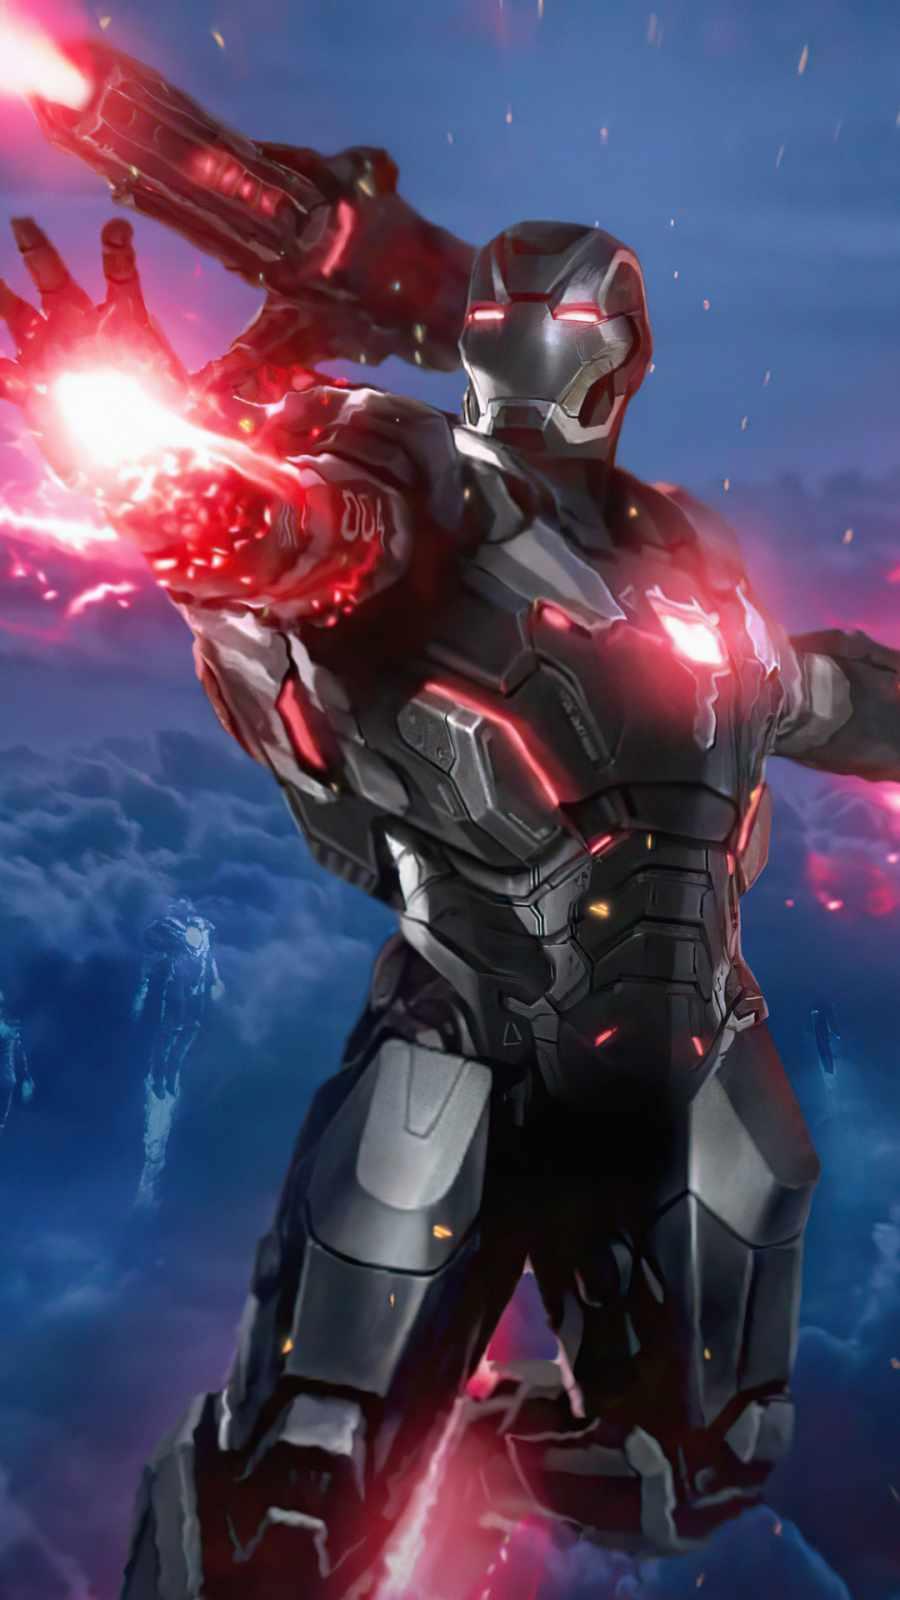 Armor wars iron man